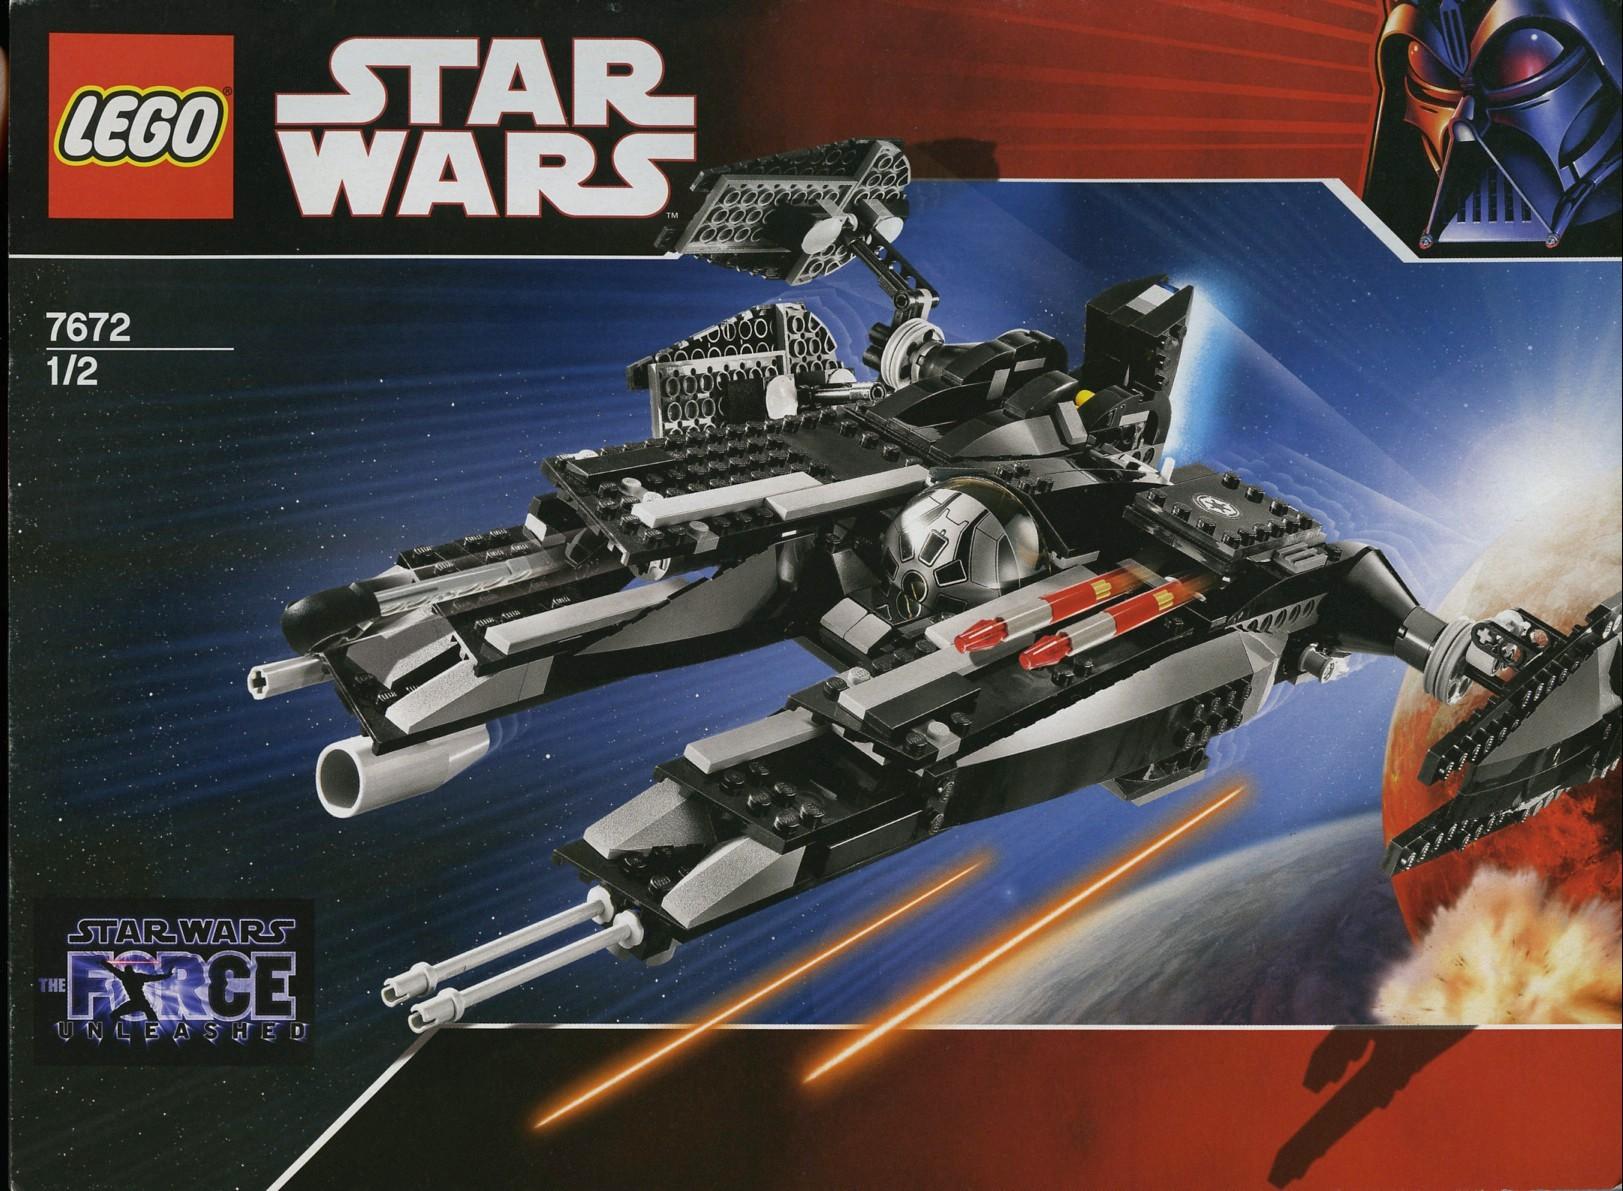 Star Wars 2008 Brickset Lego Set Guide And Database